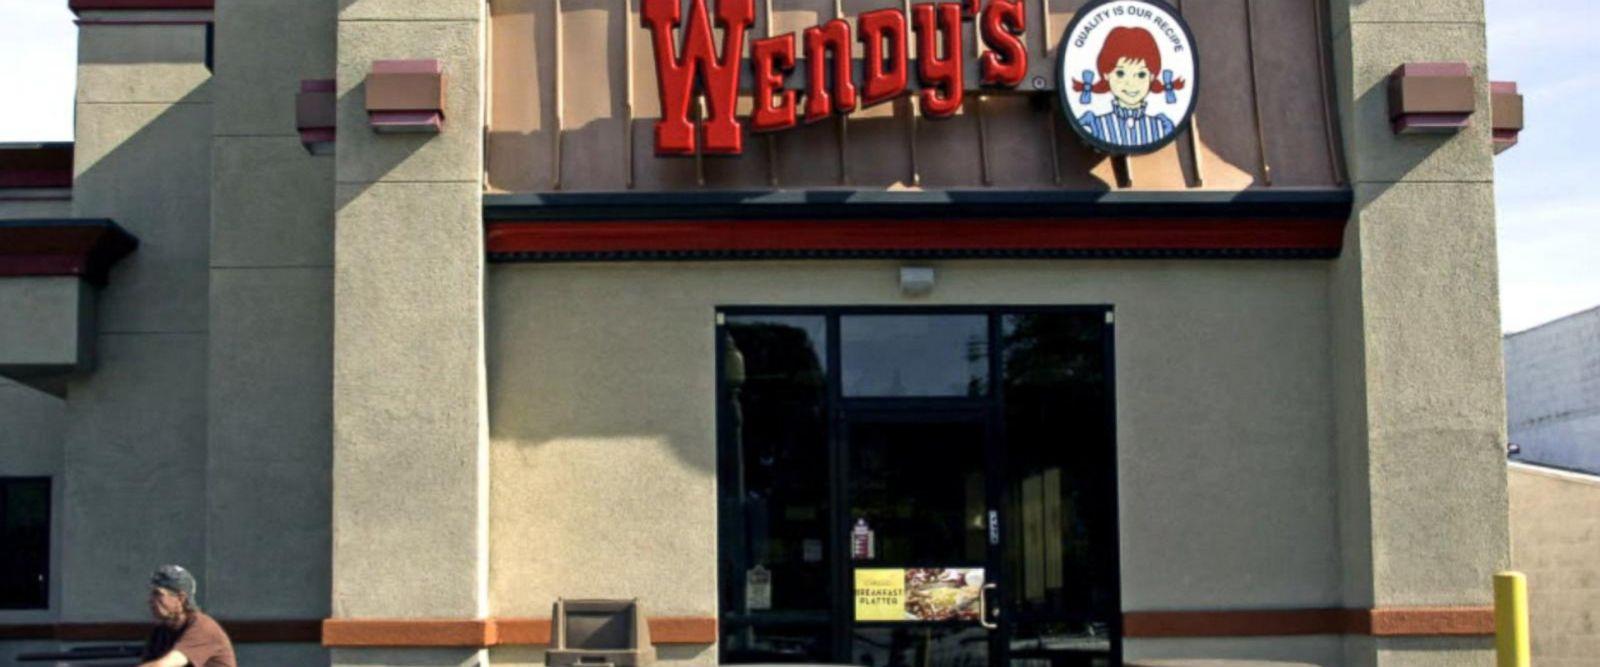 VIDEO: Wendy's adding self-order kiosks